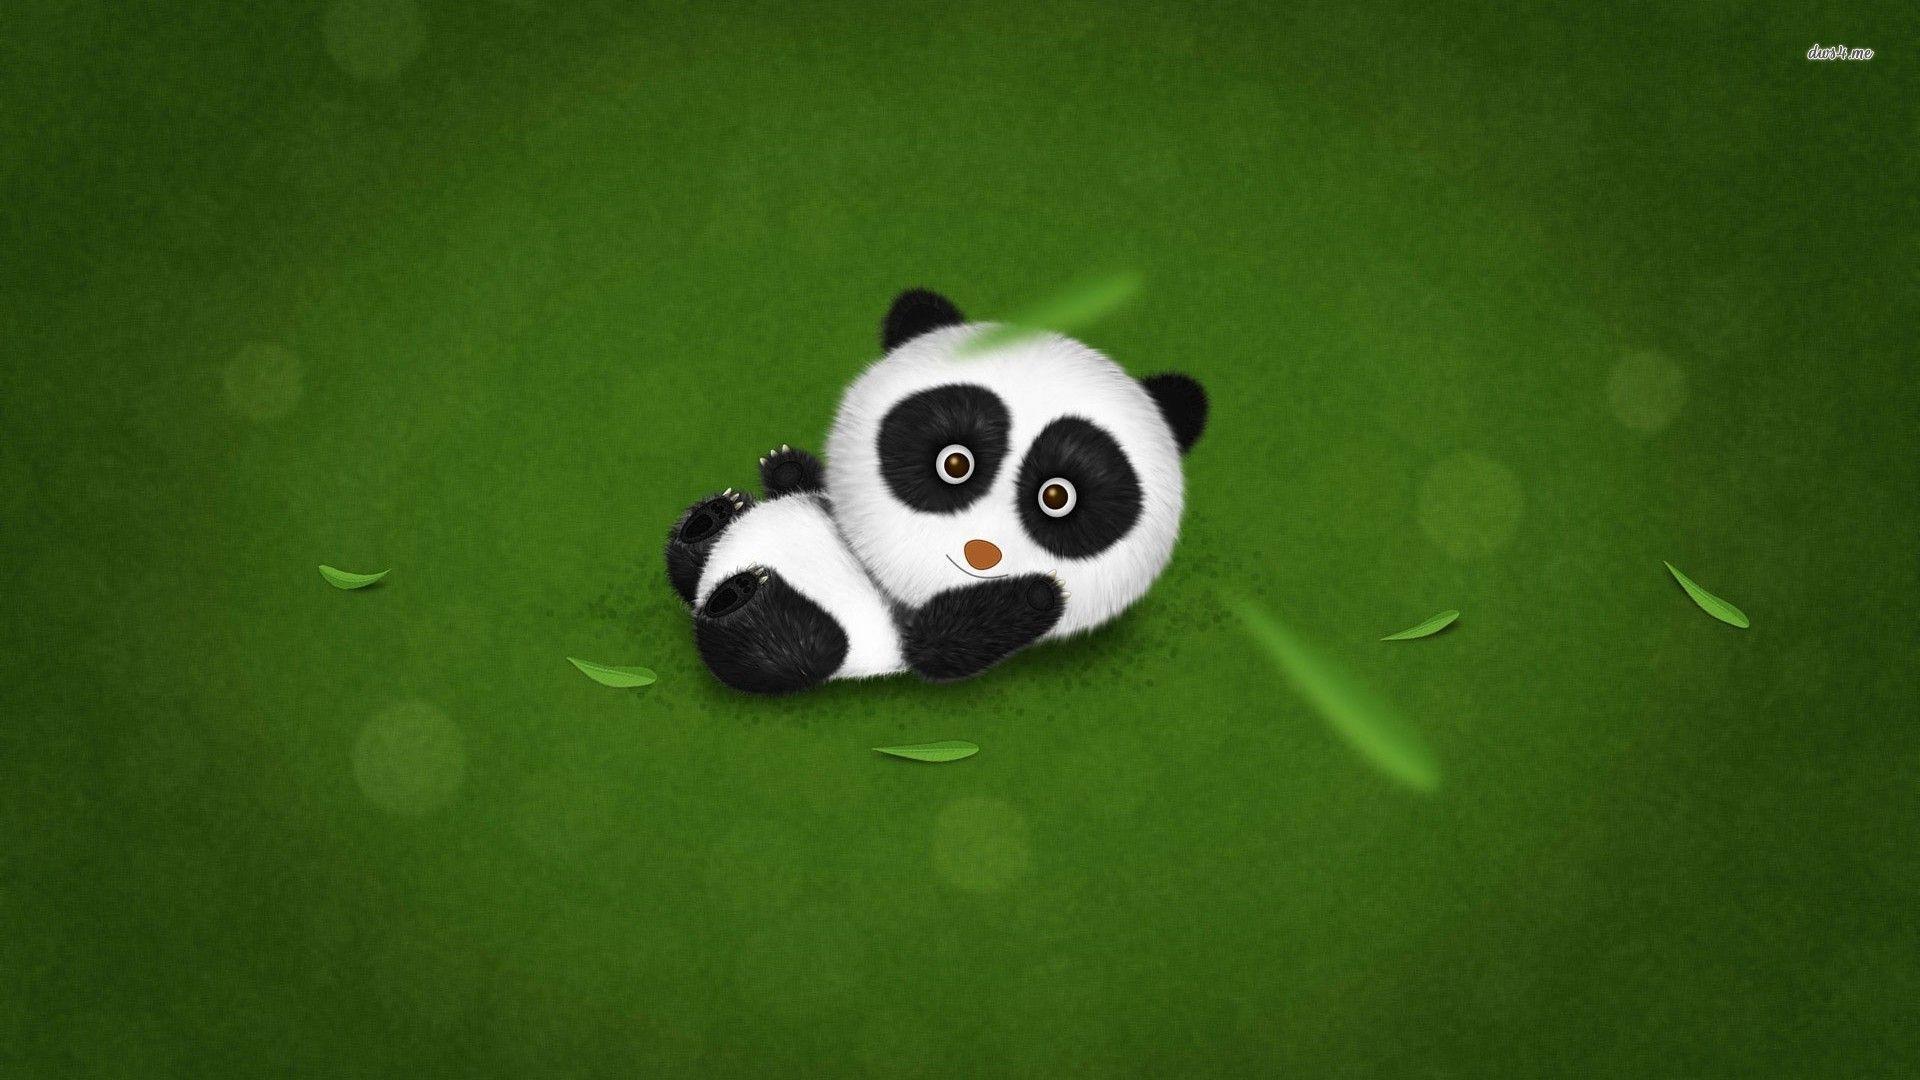 Funny Cartoon Panda Wallpapers Top Free Funny Cartoon Panda Backgrounds Wallpaperaccess